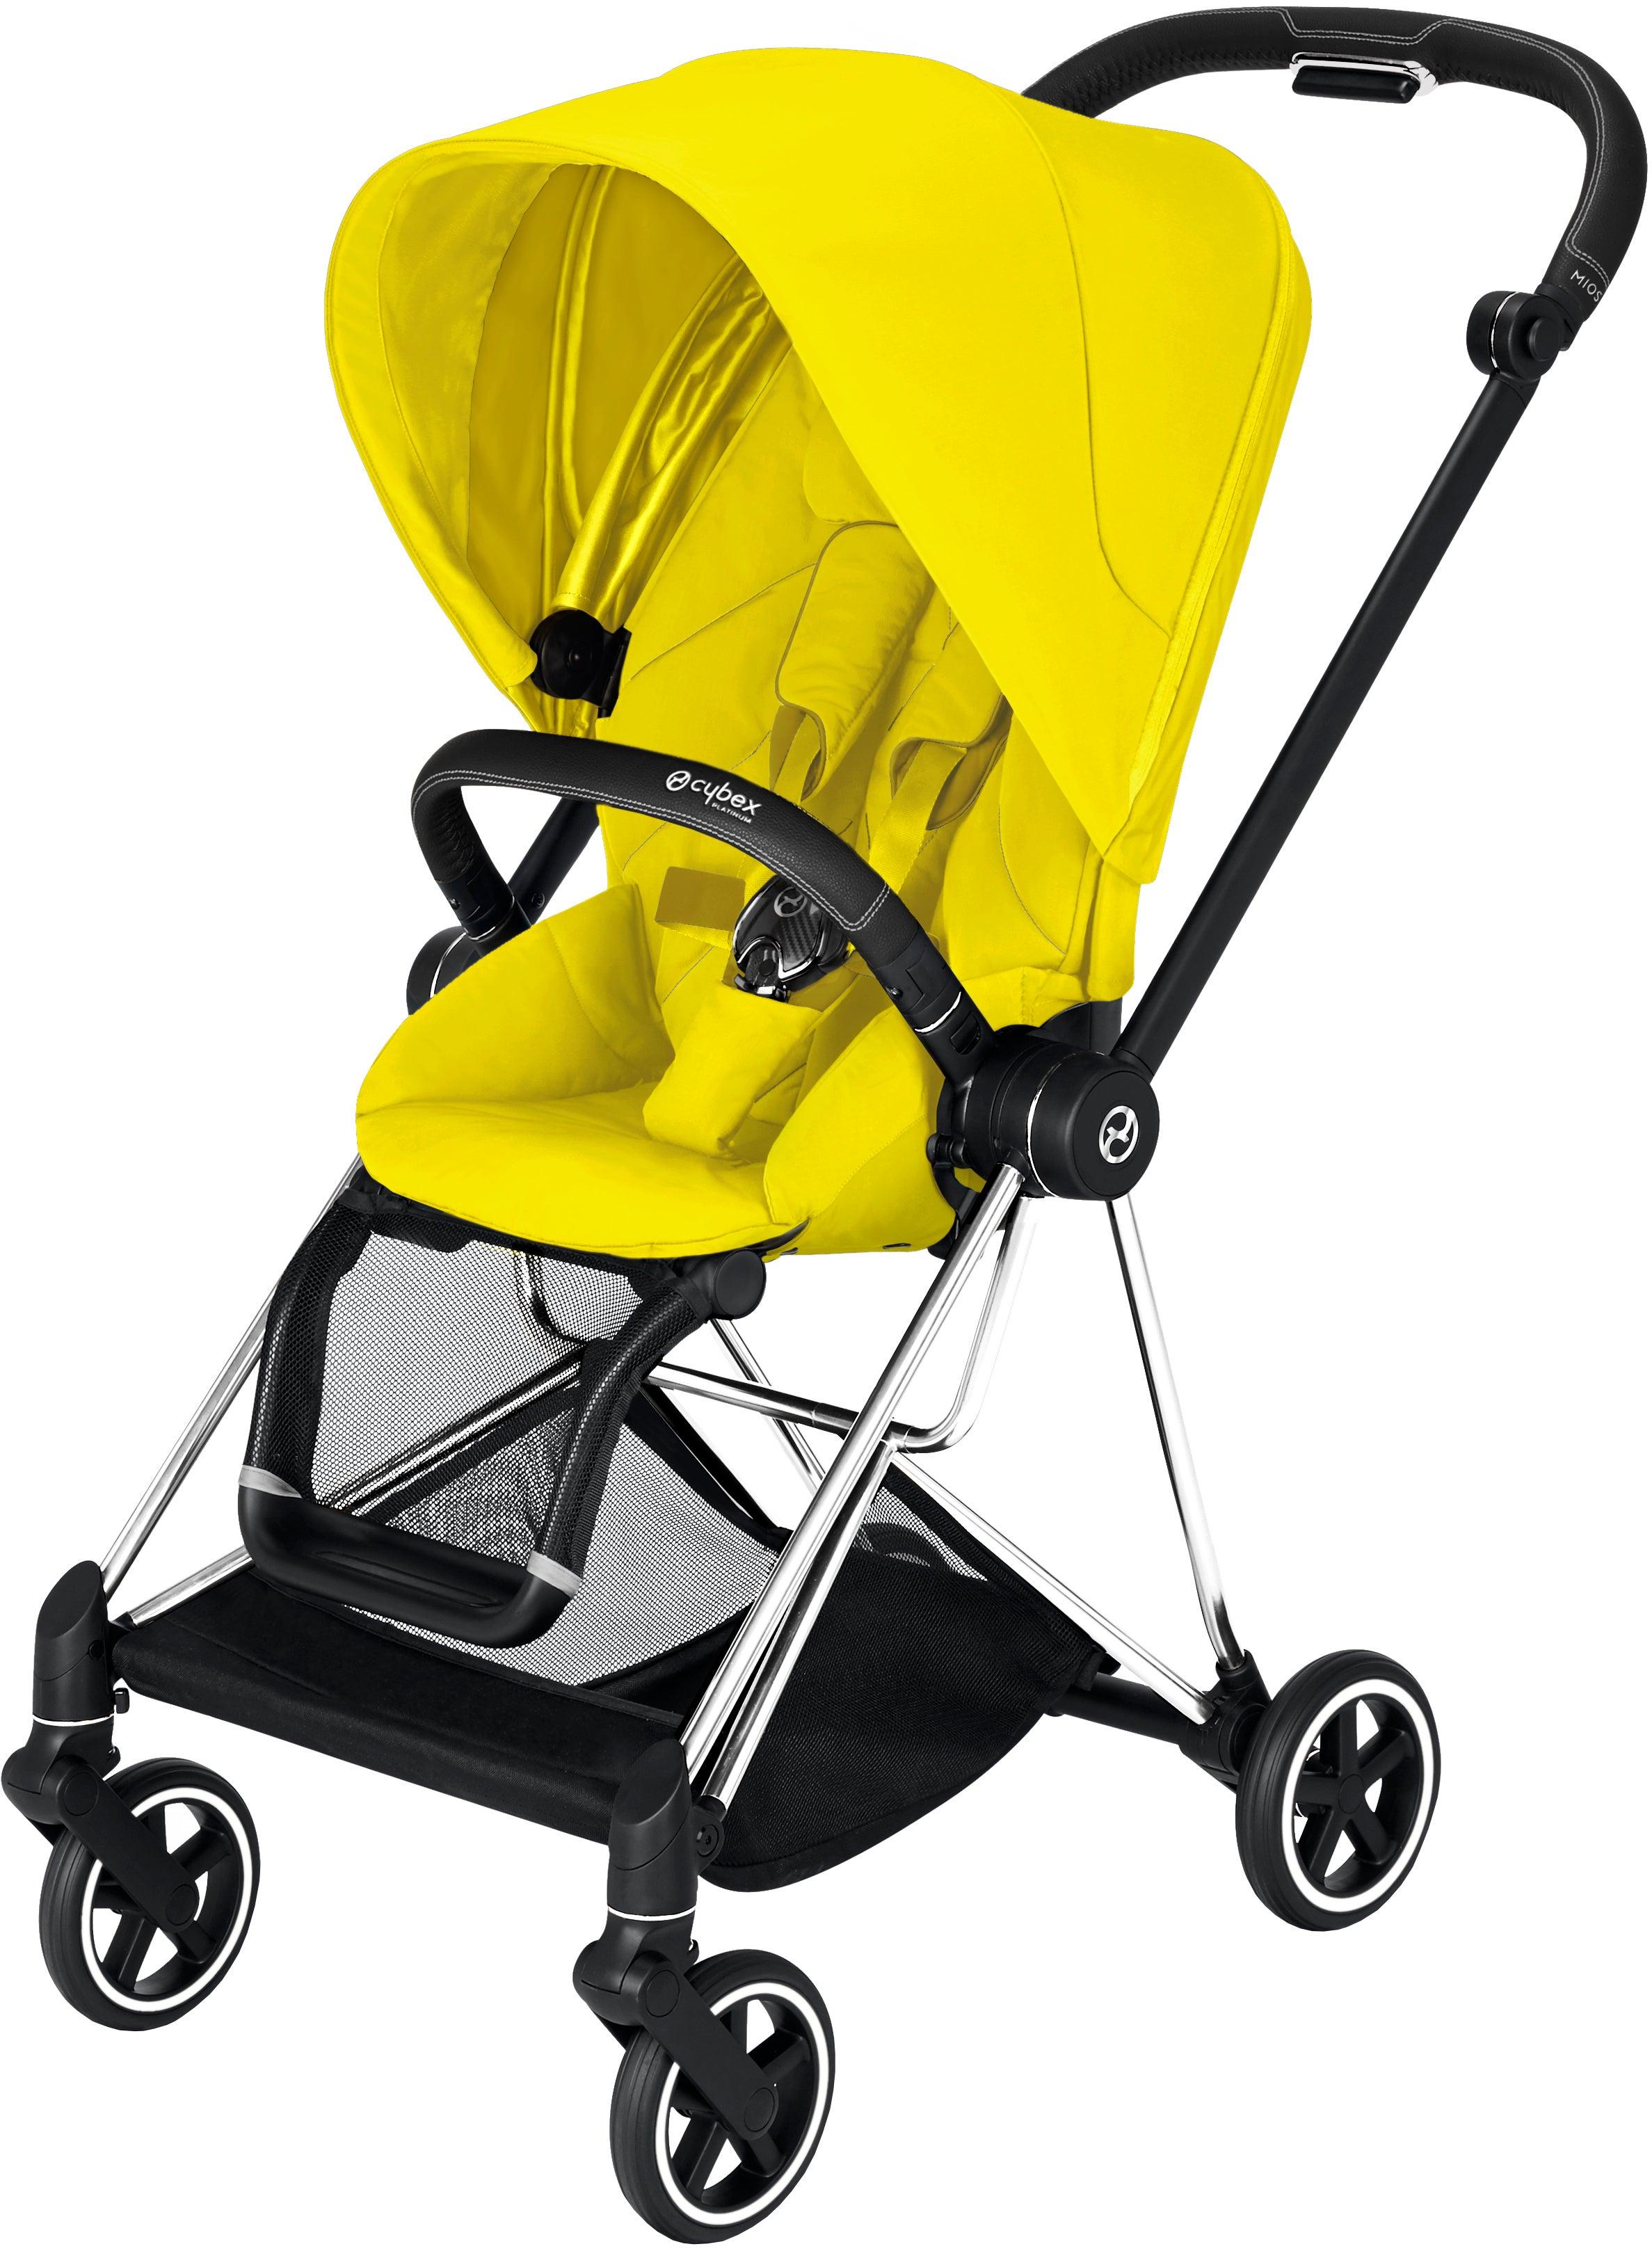 Cybex Mios Sittvagn, Chrome Black/ Mustard Yellow